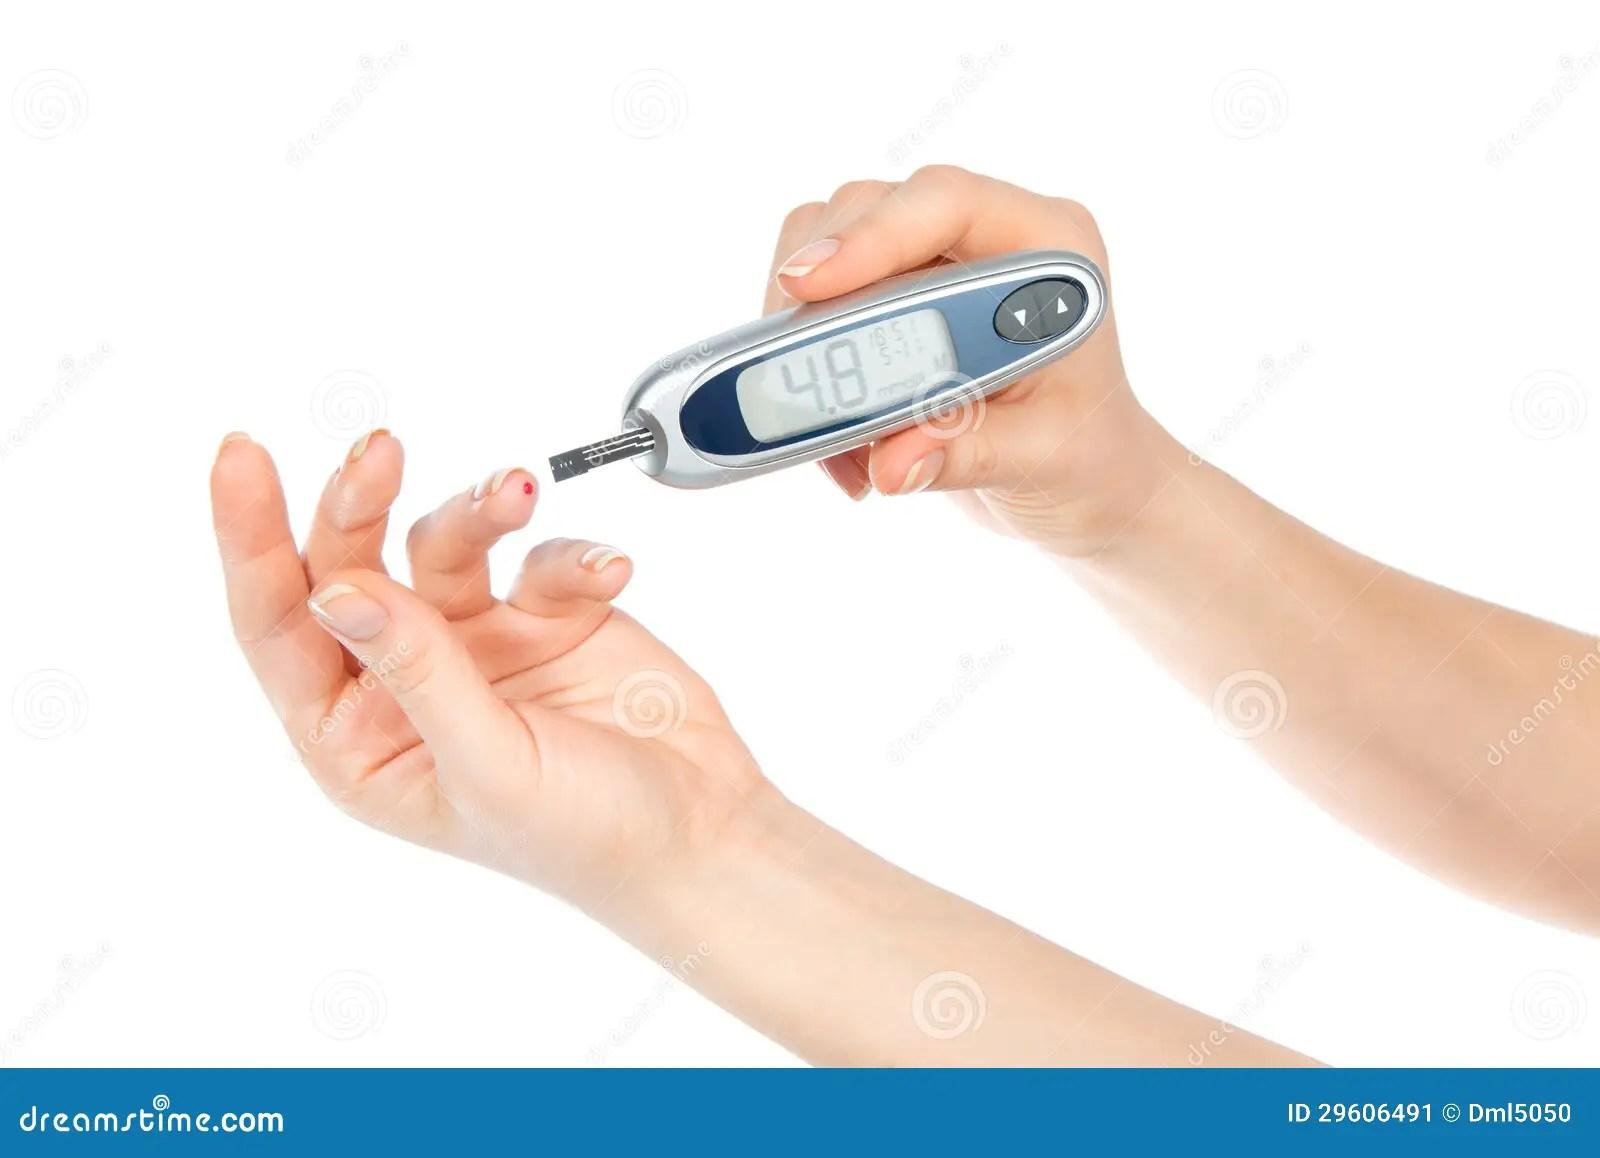 Diabetes Concept Measuring Glucose Level Blood Test Stock Image